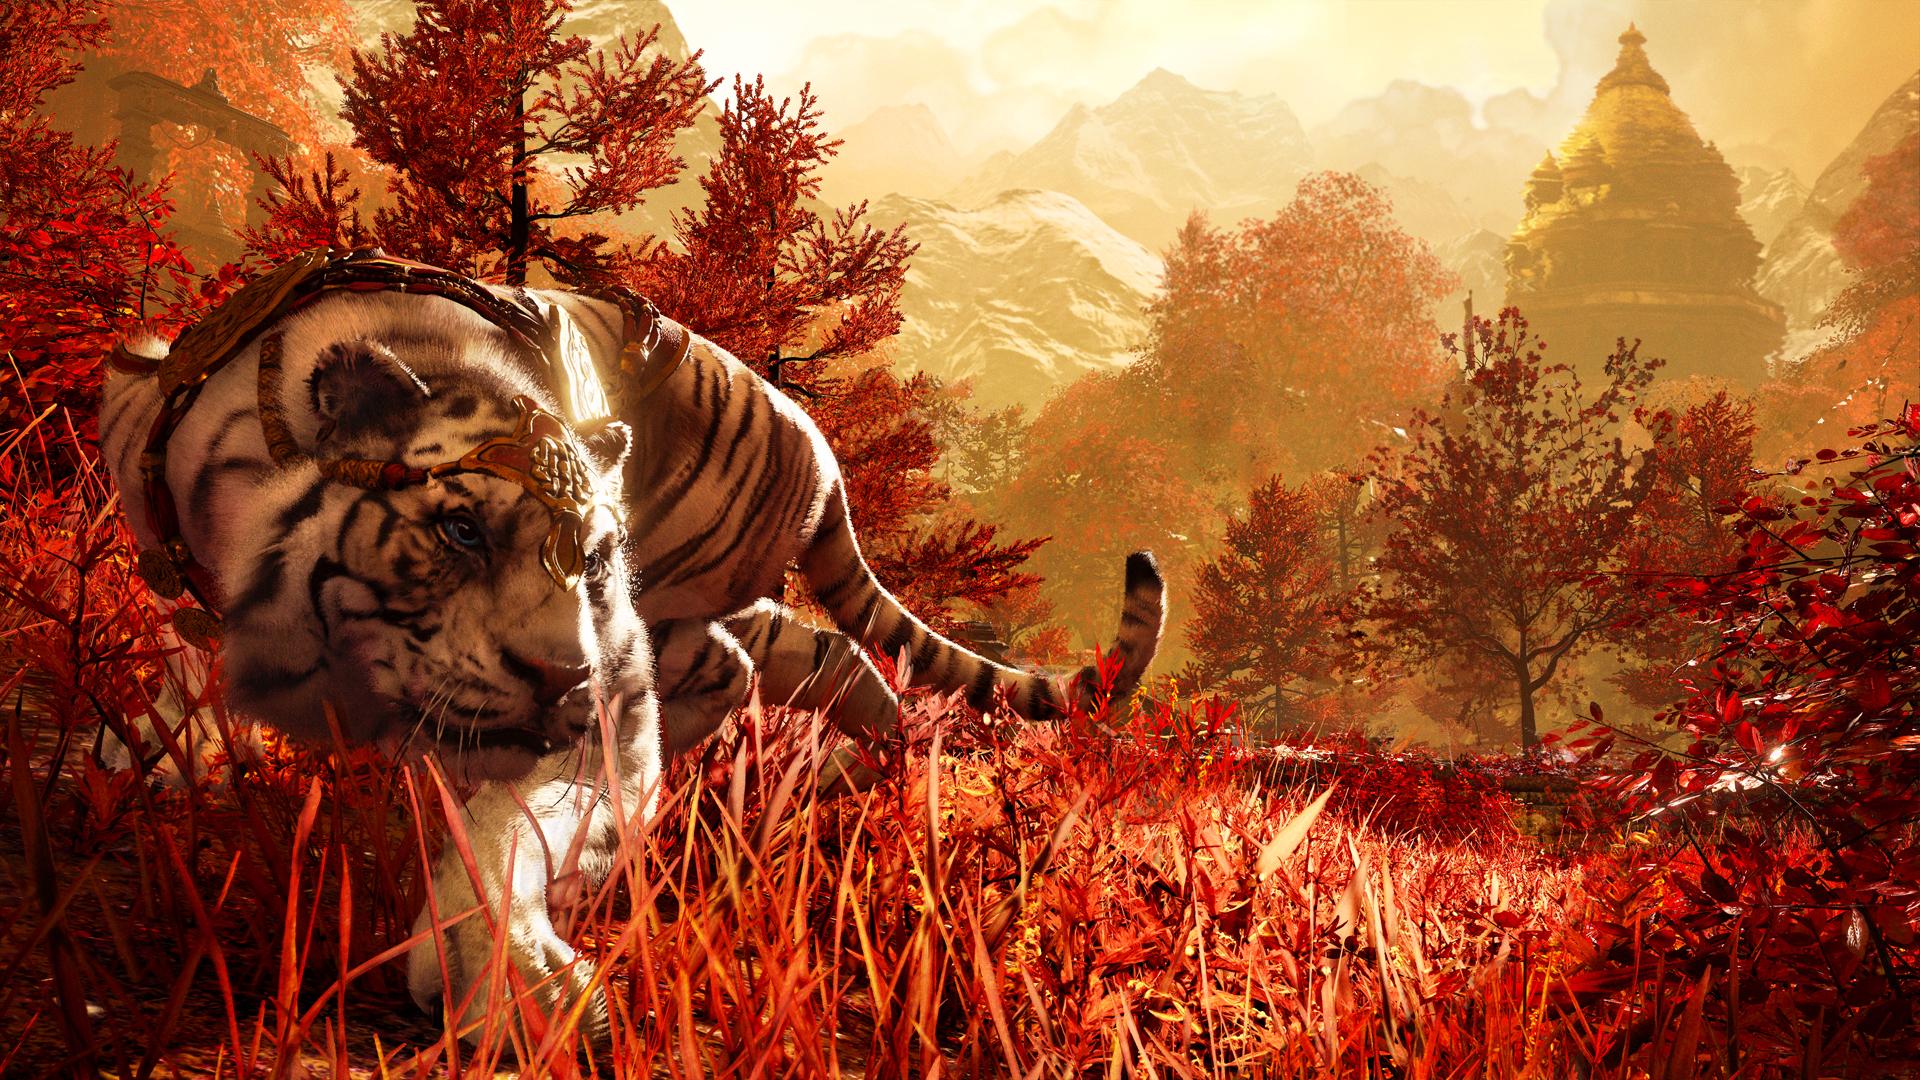 Free Download Far Cry 4 Jeux Video Fond Ecran Wallpaper 23